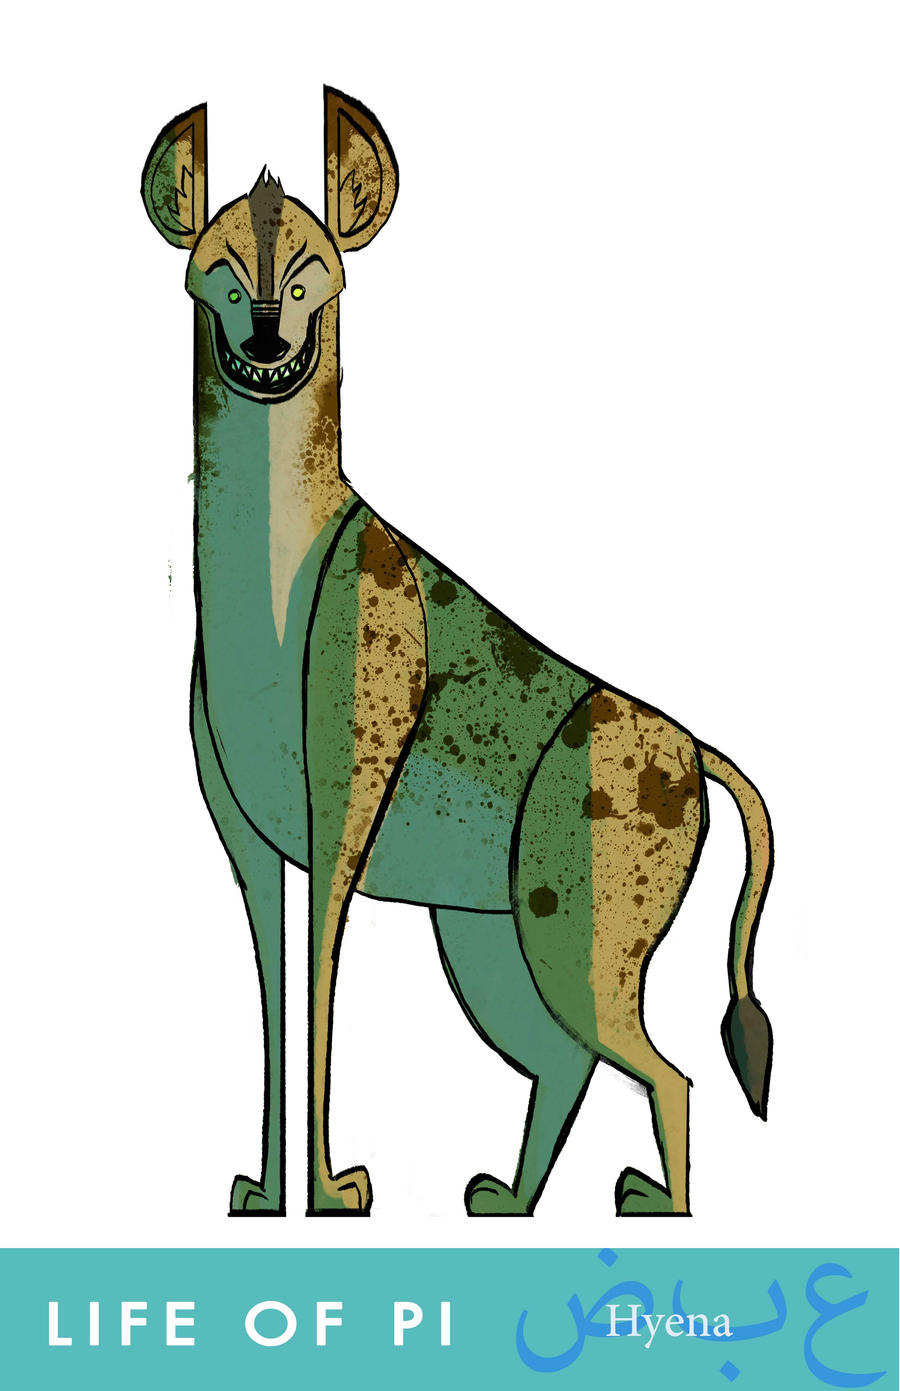 Life of pi hyena by yebkamin on deviantart for Life of pi animals